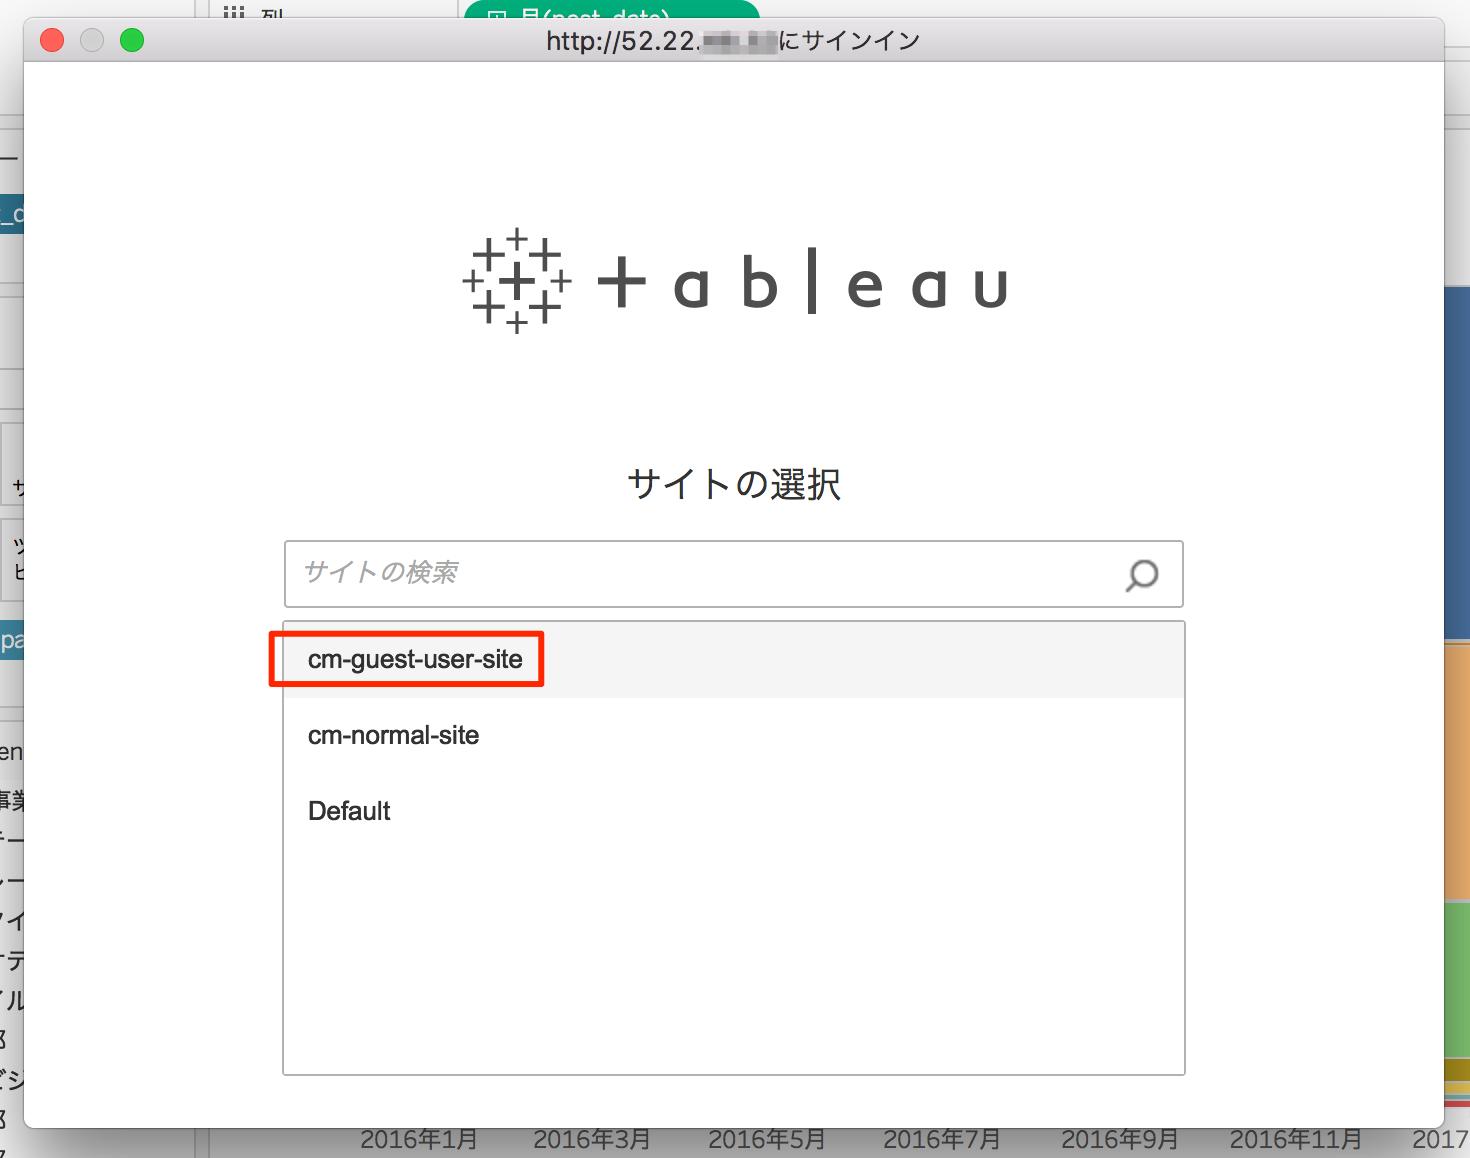 tableau-server-core-lisence-guest-user-option_12